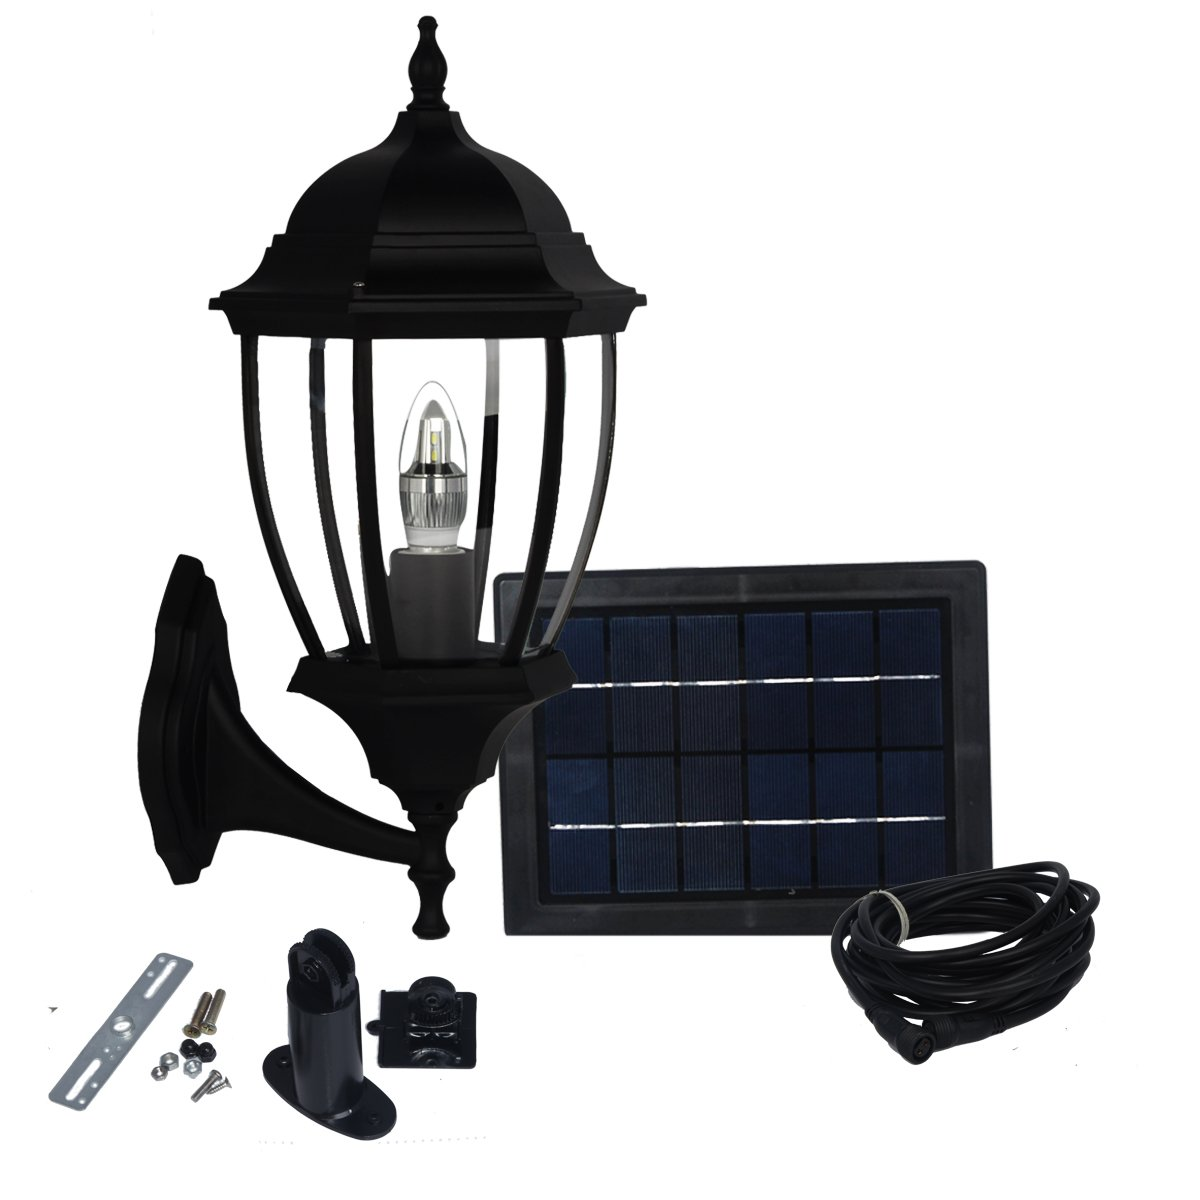 Kendal Large Outdoor Solar powered 1.3W LED, 6600MA Battery, 5W solar panels Garden Light Lamp SL-7404